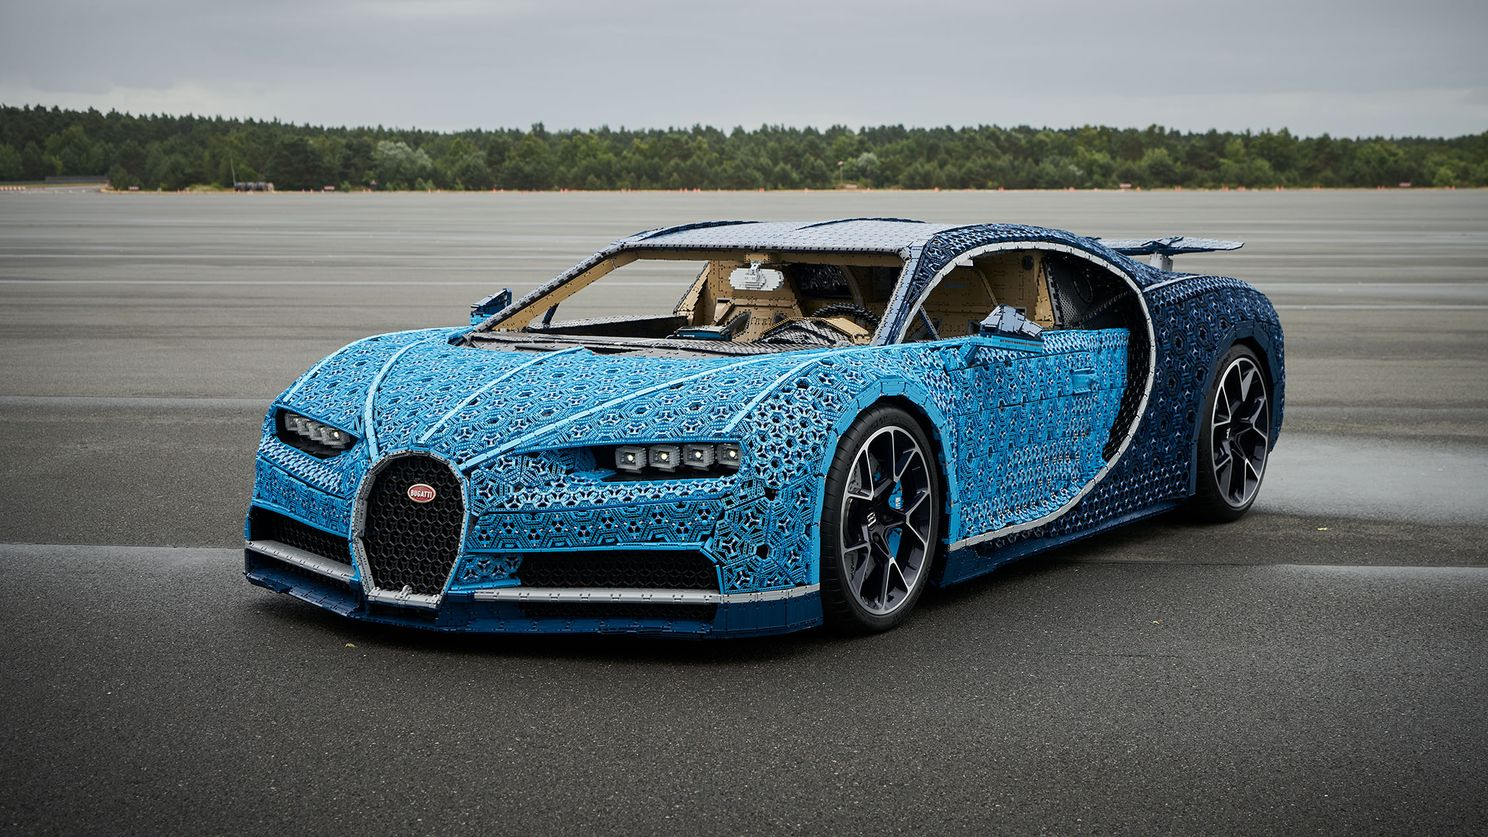 Lego Technic maakt de Bugatti Chiron levensecht